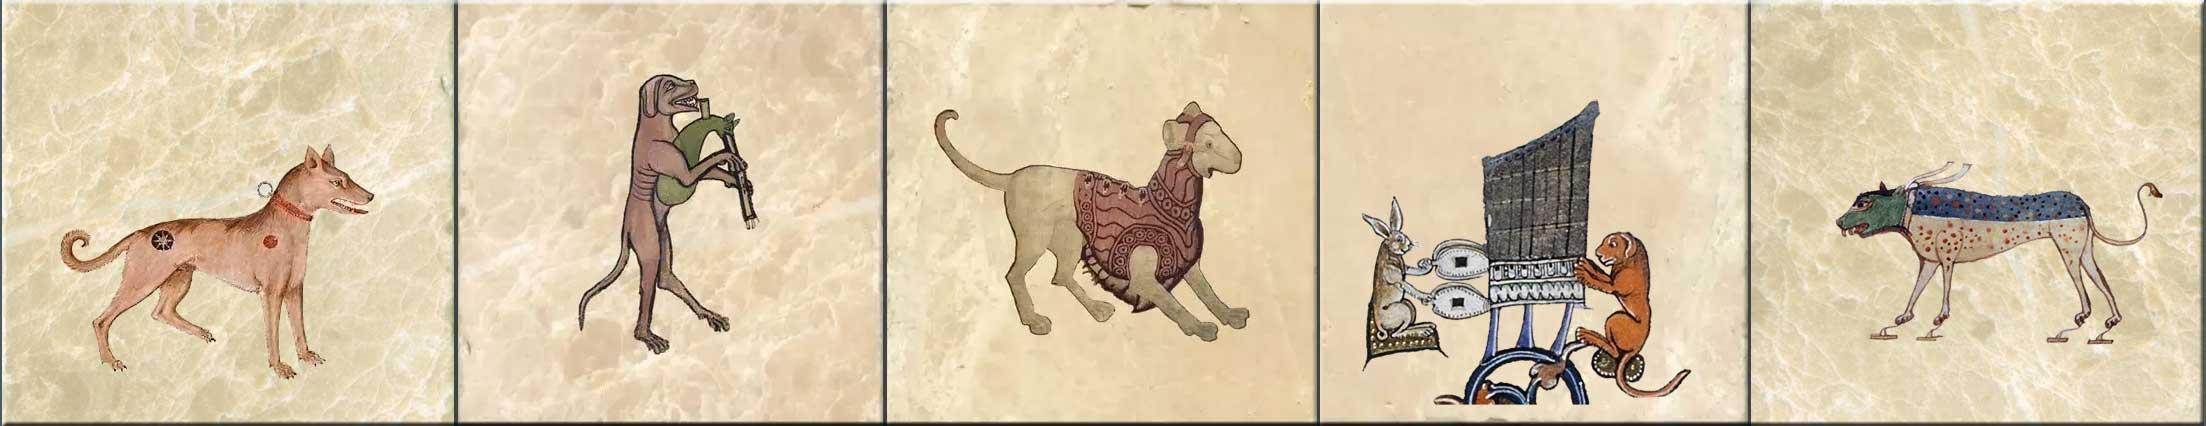 Medieval Dogs, dog tiles. WilliamMorrisTile.com